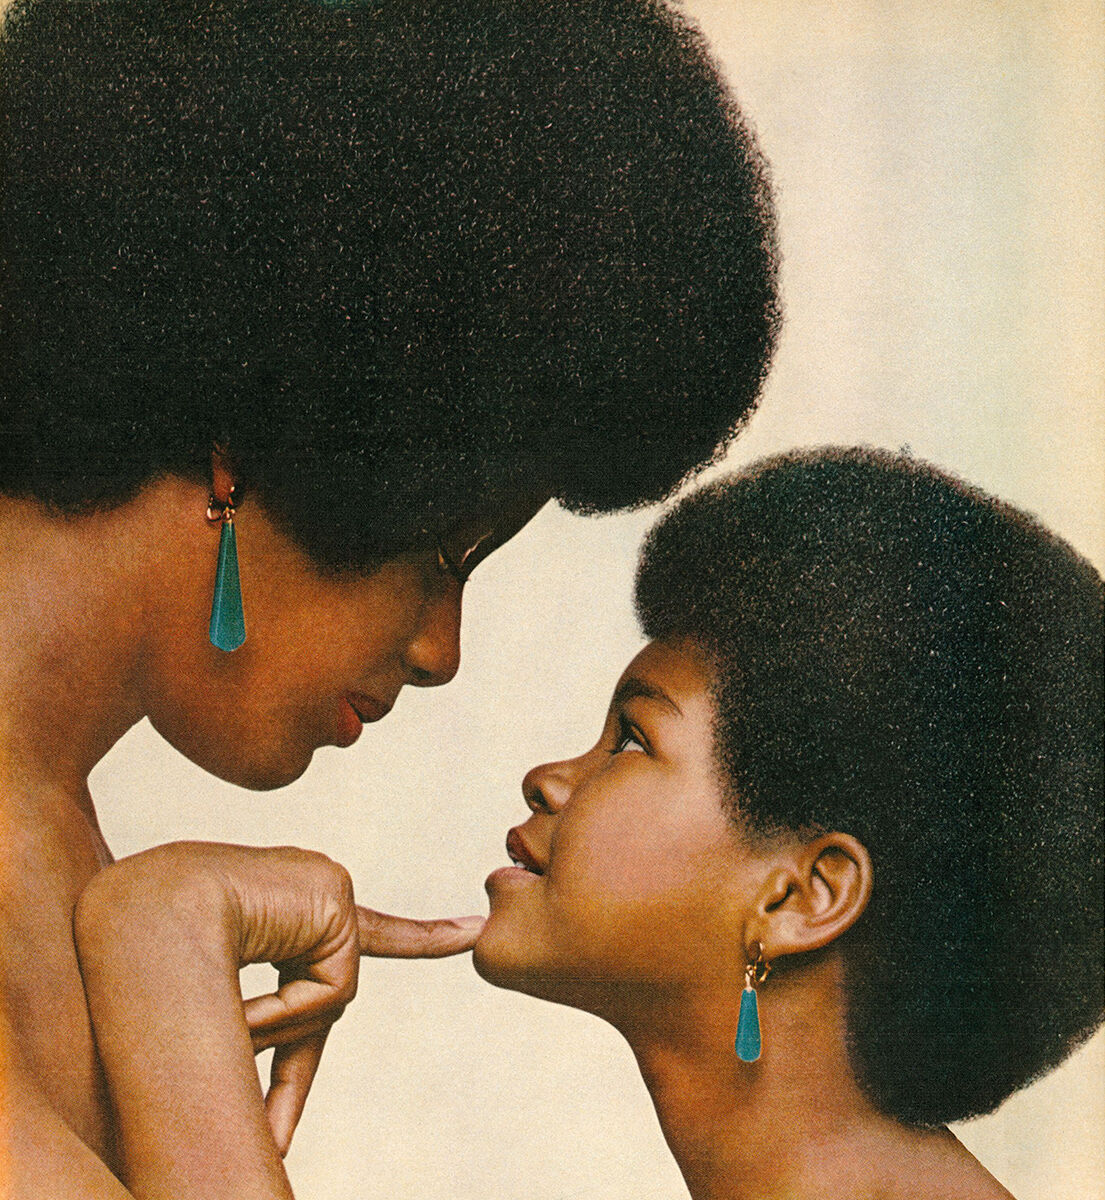 Hank Willis Thomas, Kama Mama, Kama Binti (Like mother like daughter), 1971/2008. Courtesy of the artist and Jack Shainman.